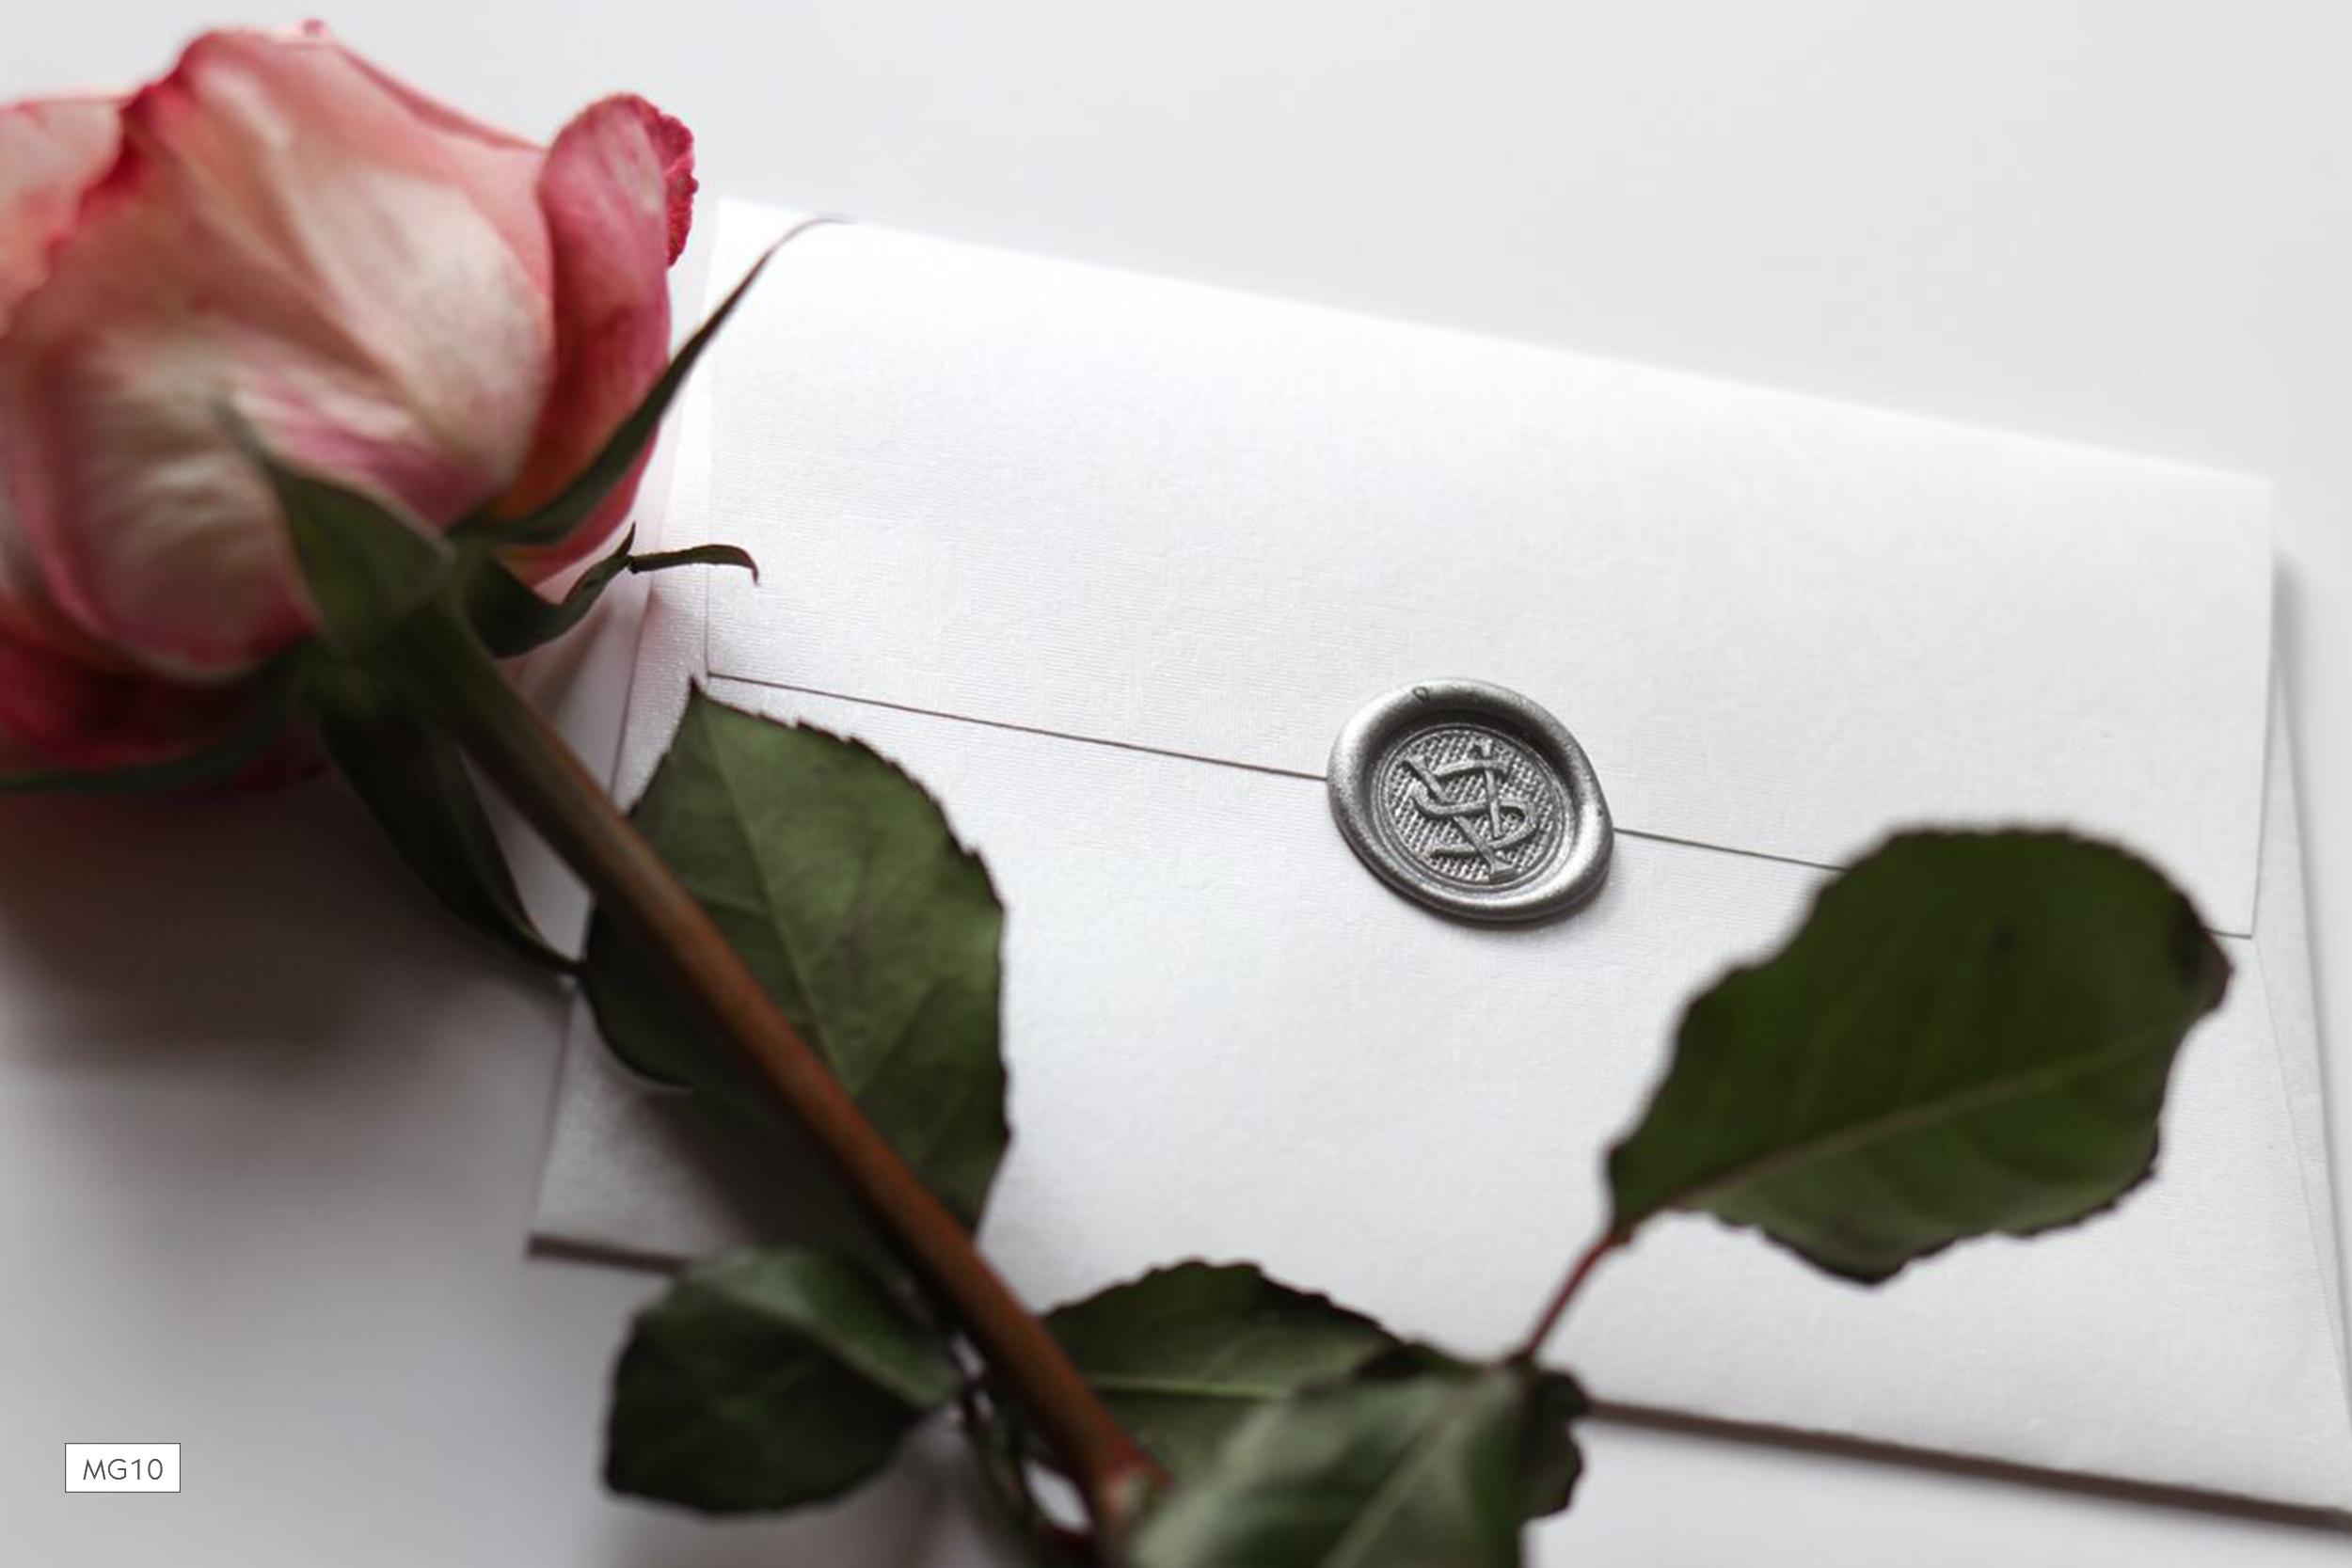 mg10-silver-wax-seal-invitation.jpg